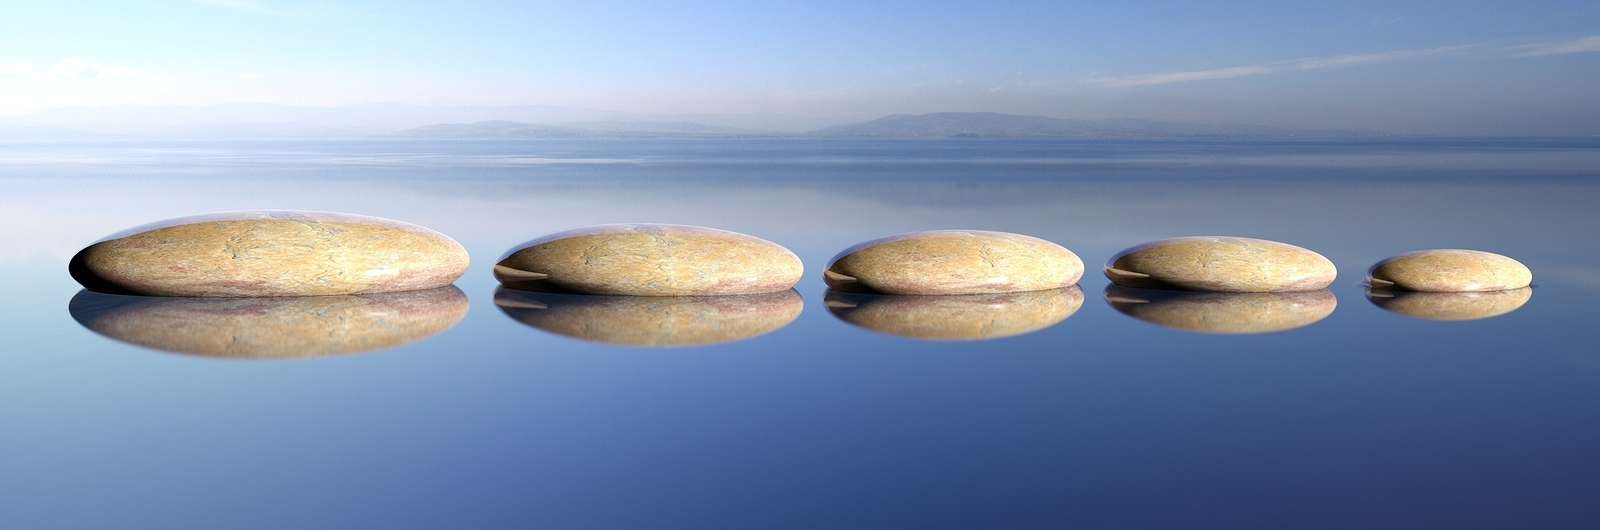 bigstock-Zen-stones-row-from-large-to-s-112300094.jpg